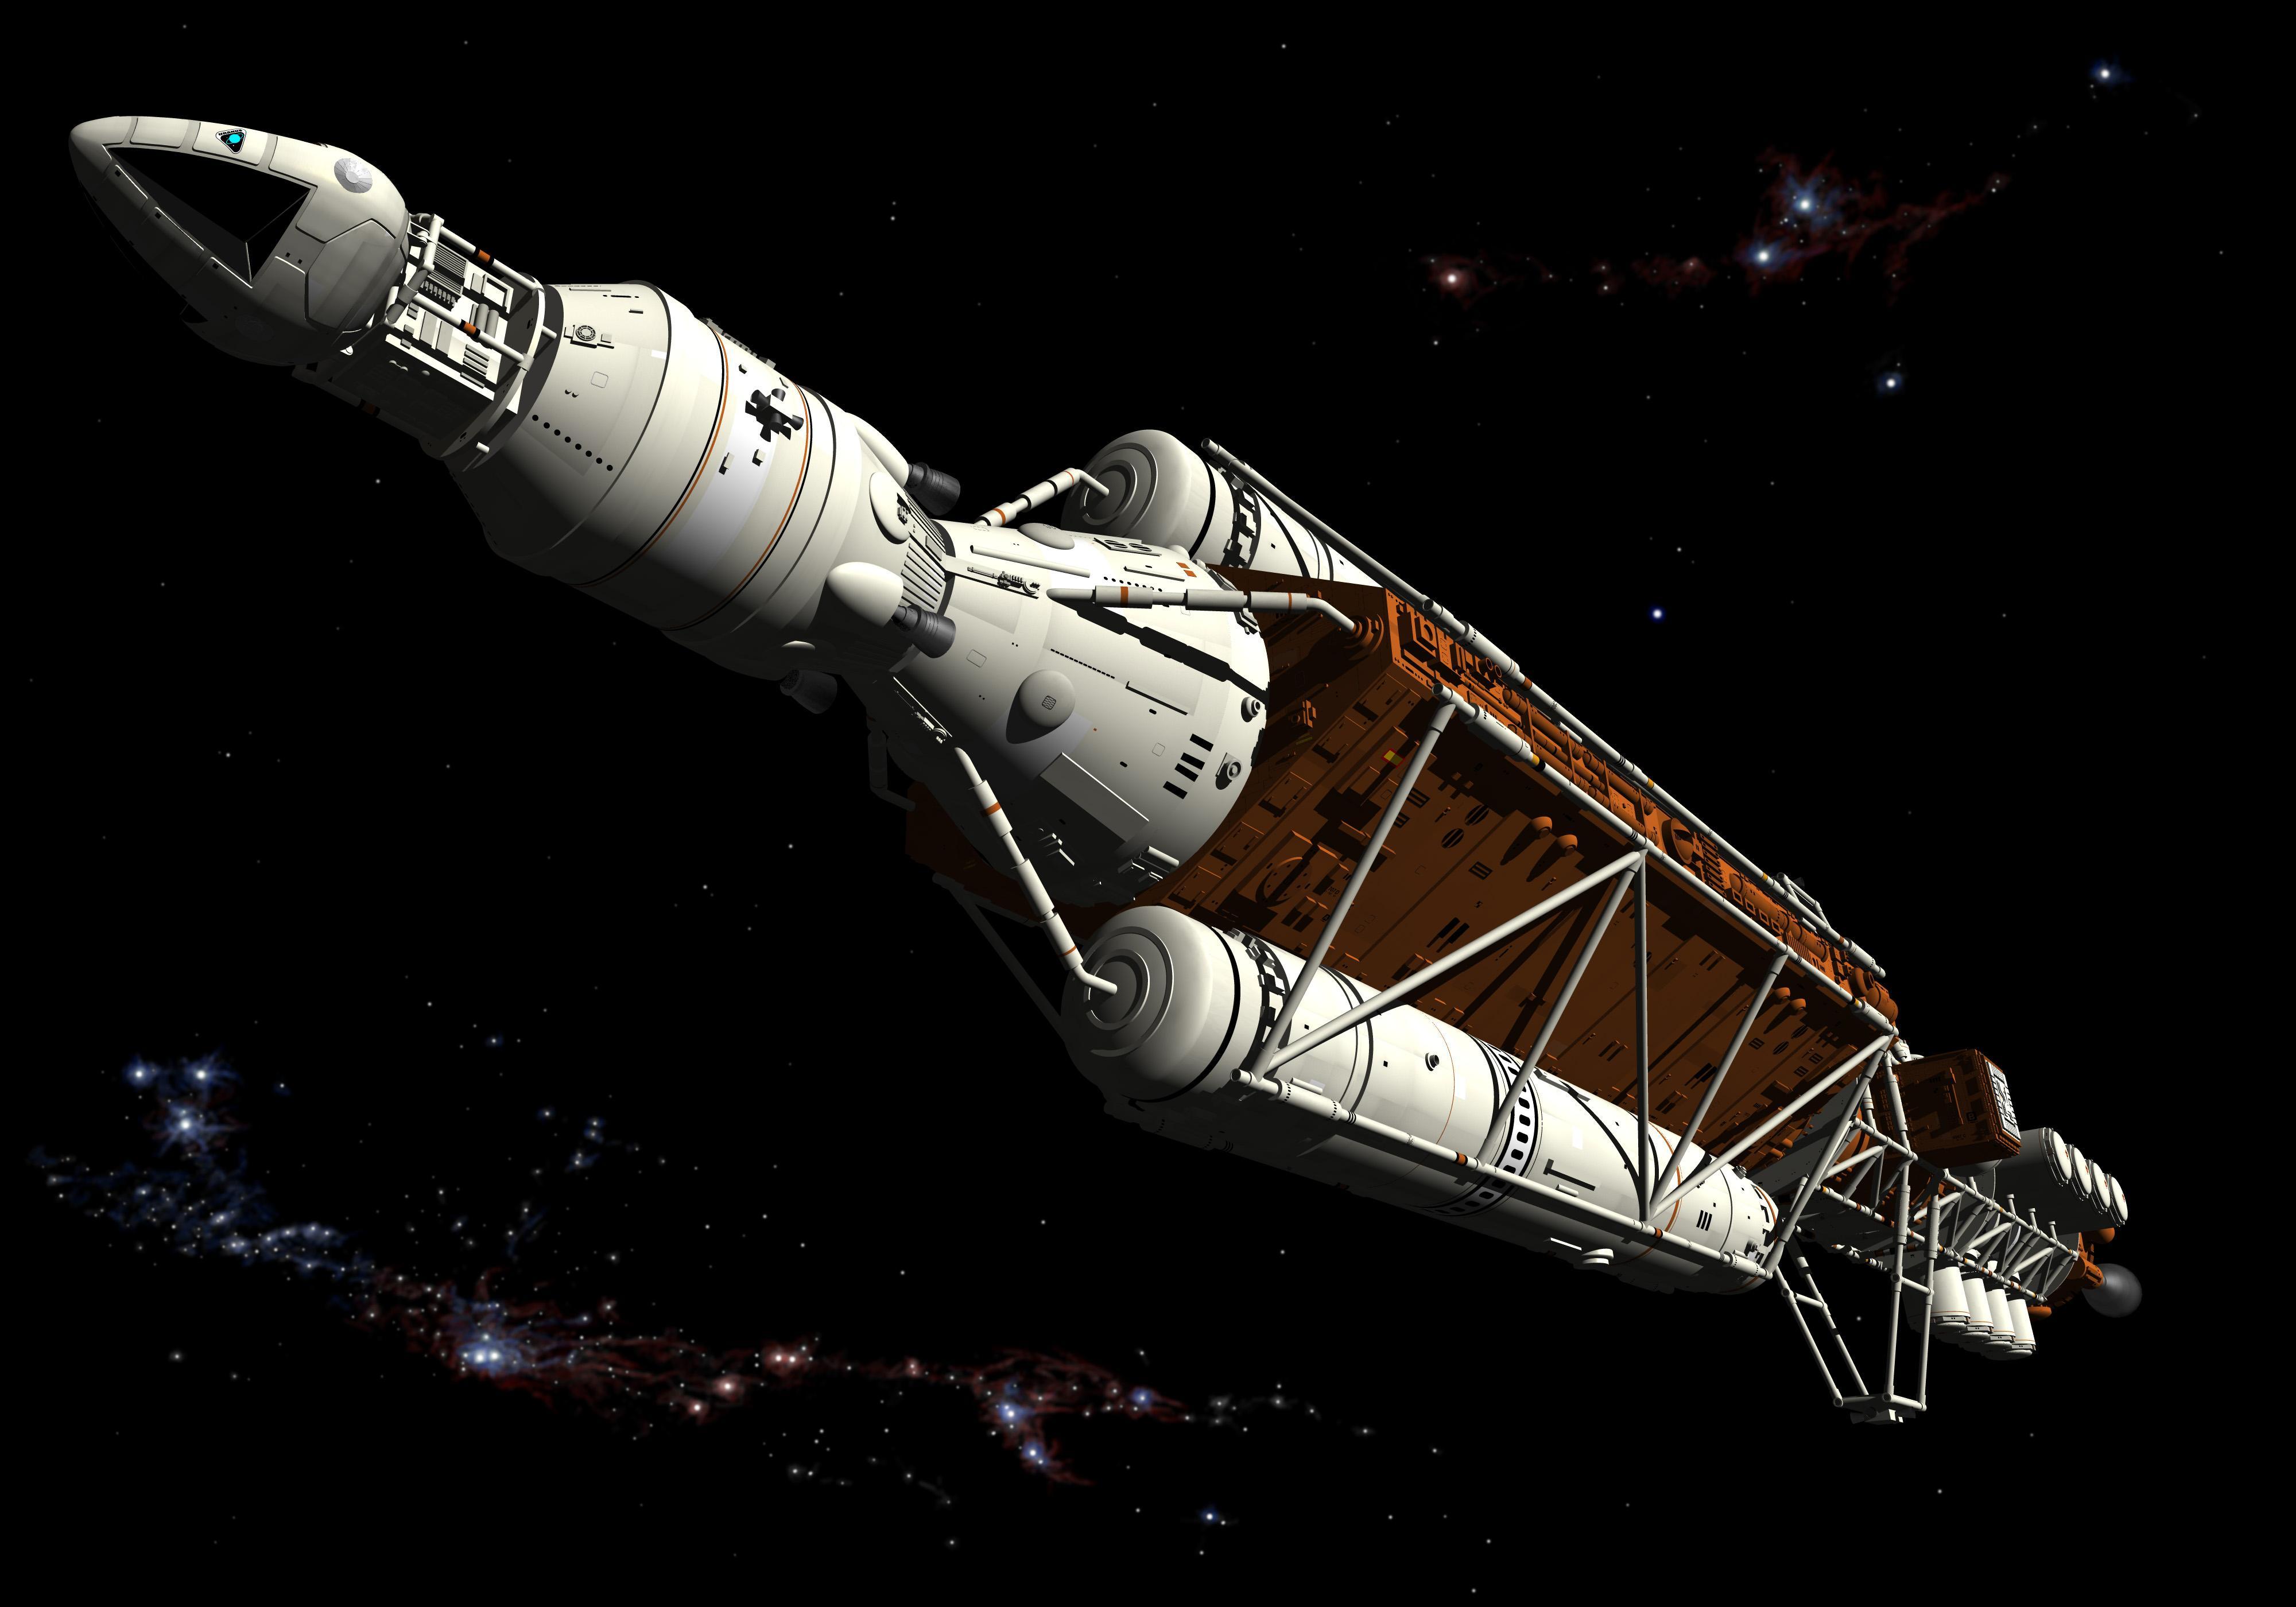 space 1999 spacecraft designs - photo #25